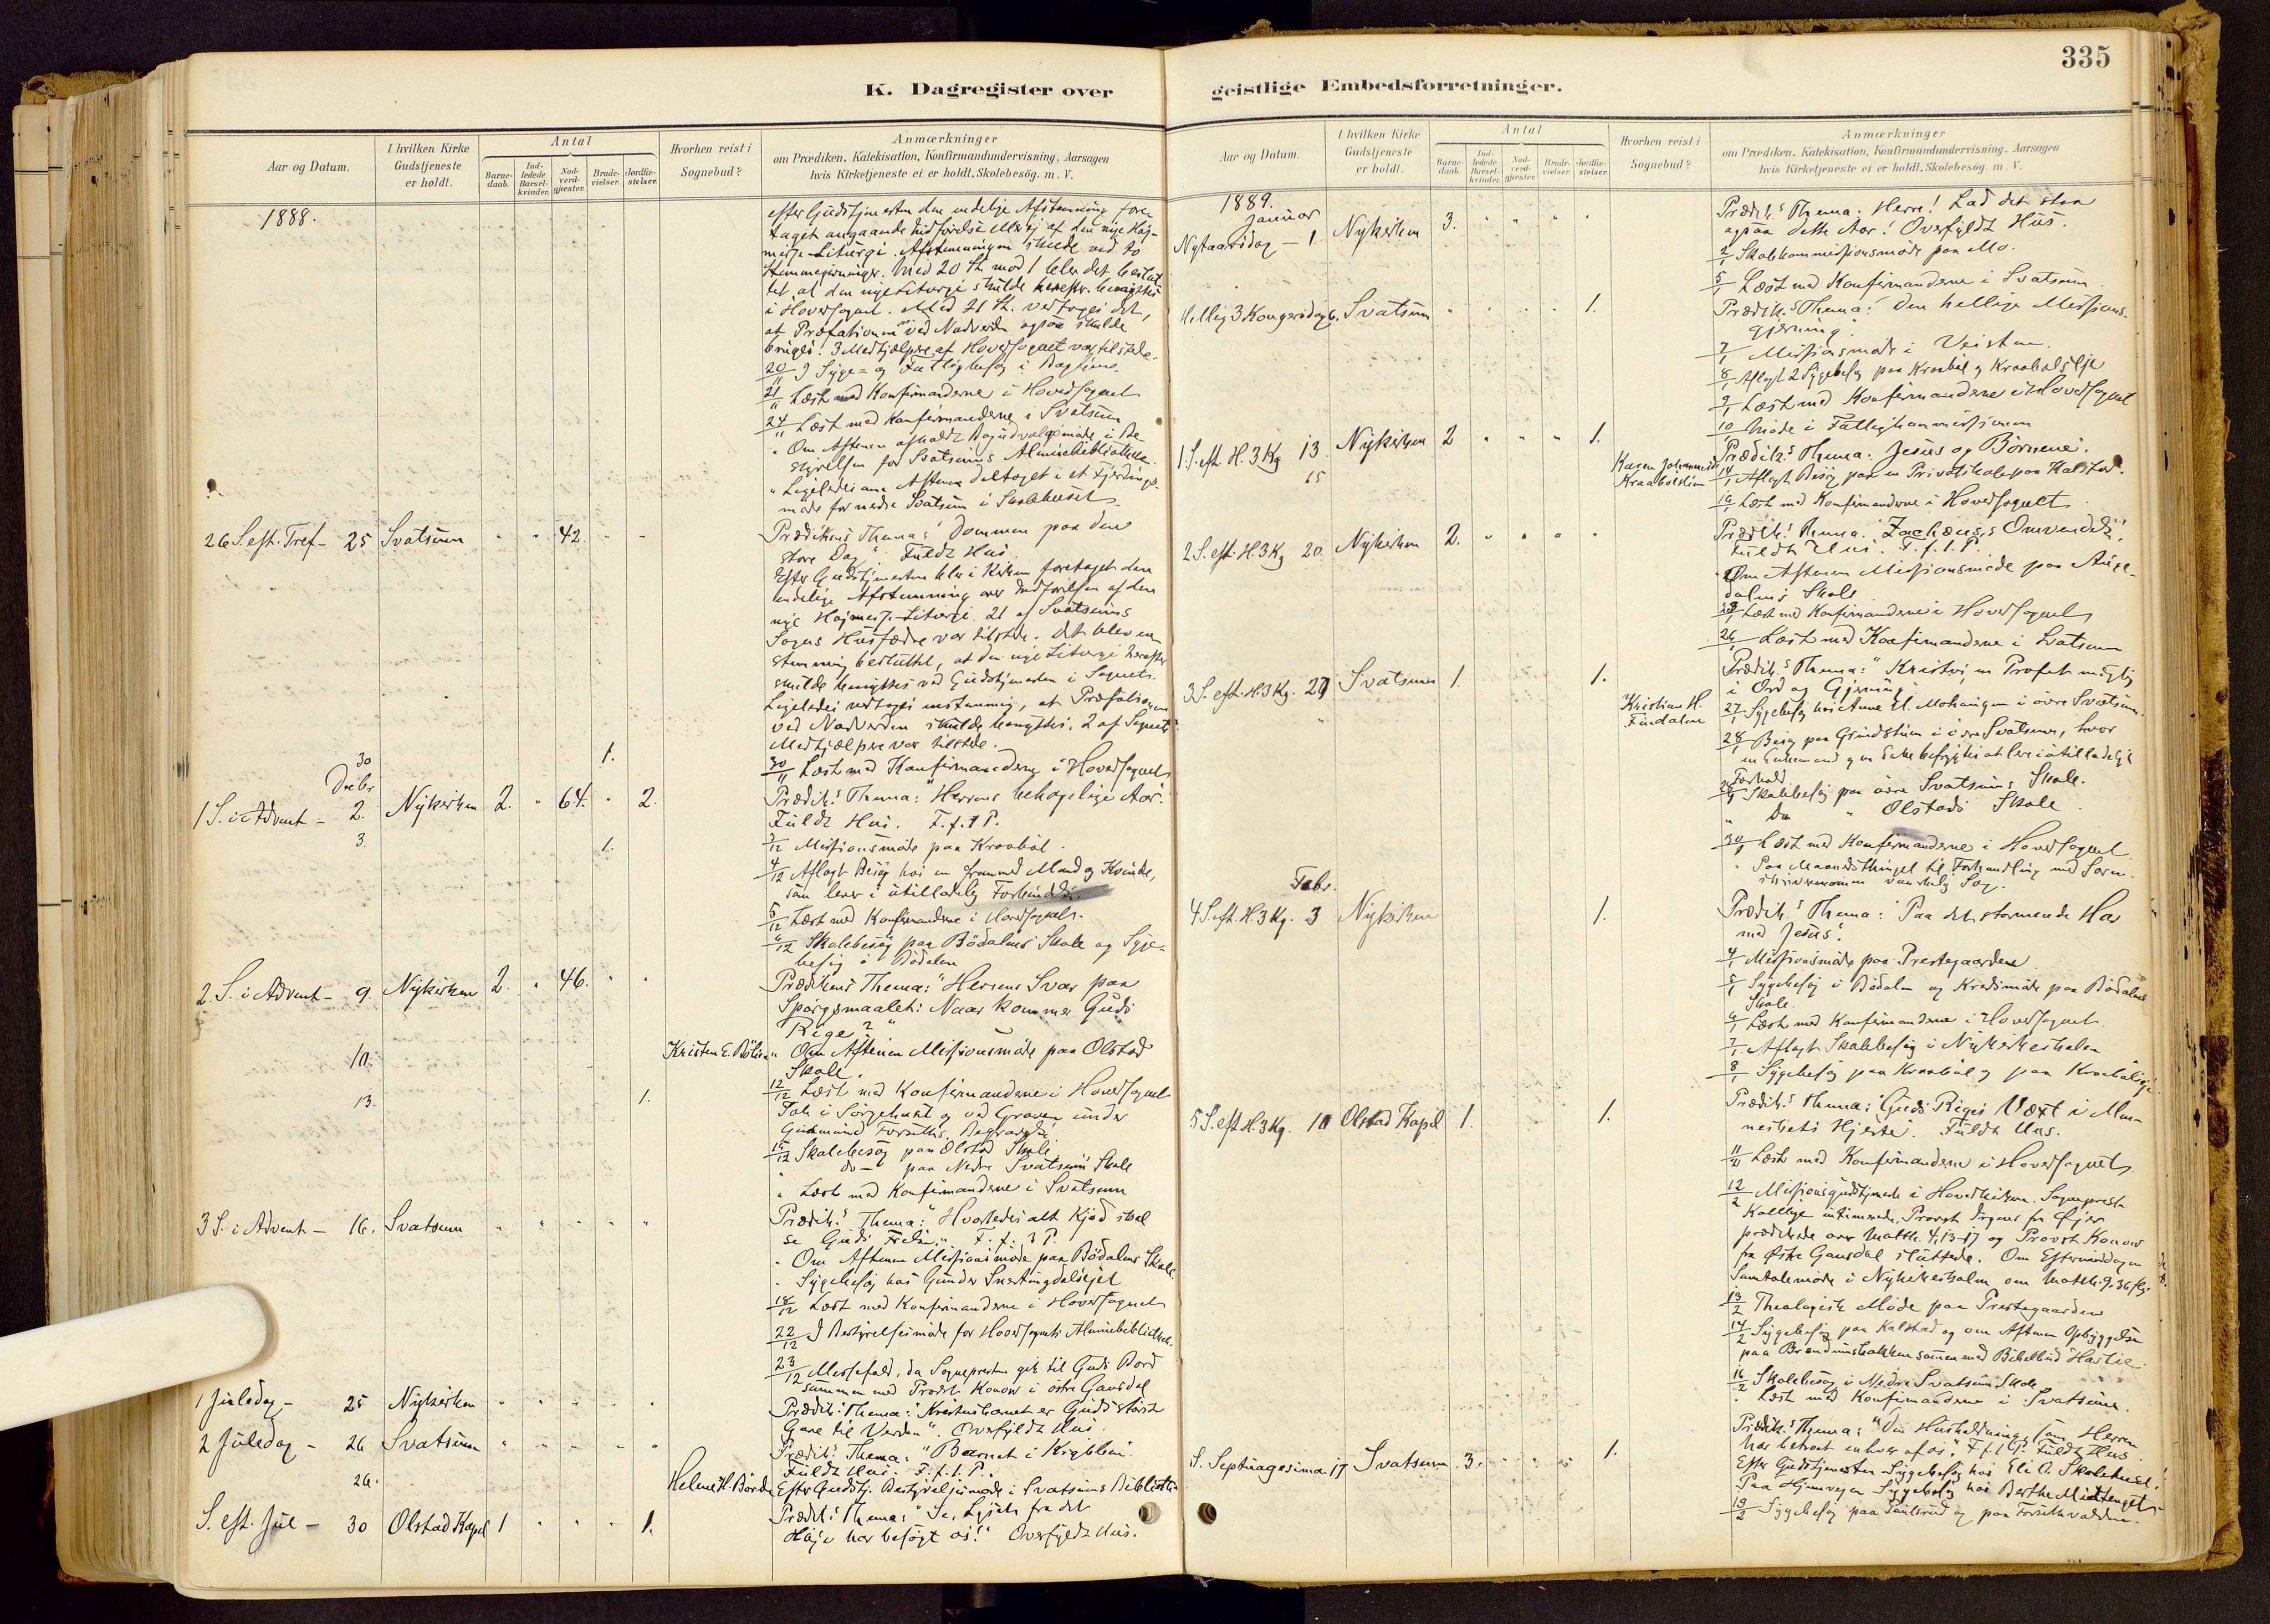 SAH, Vestre Gausdal prestekontor, Ministerialbok nr. 1, 1887-1914, s. 335